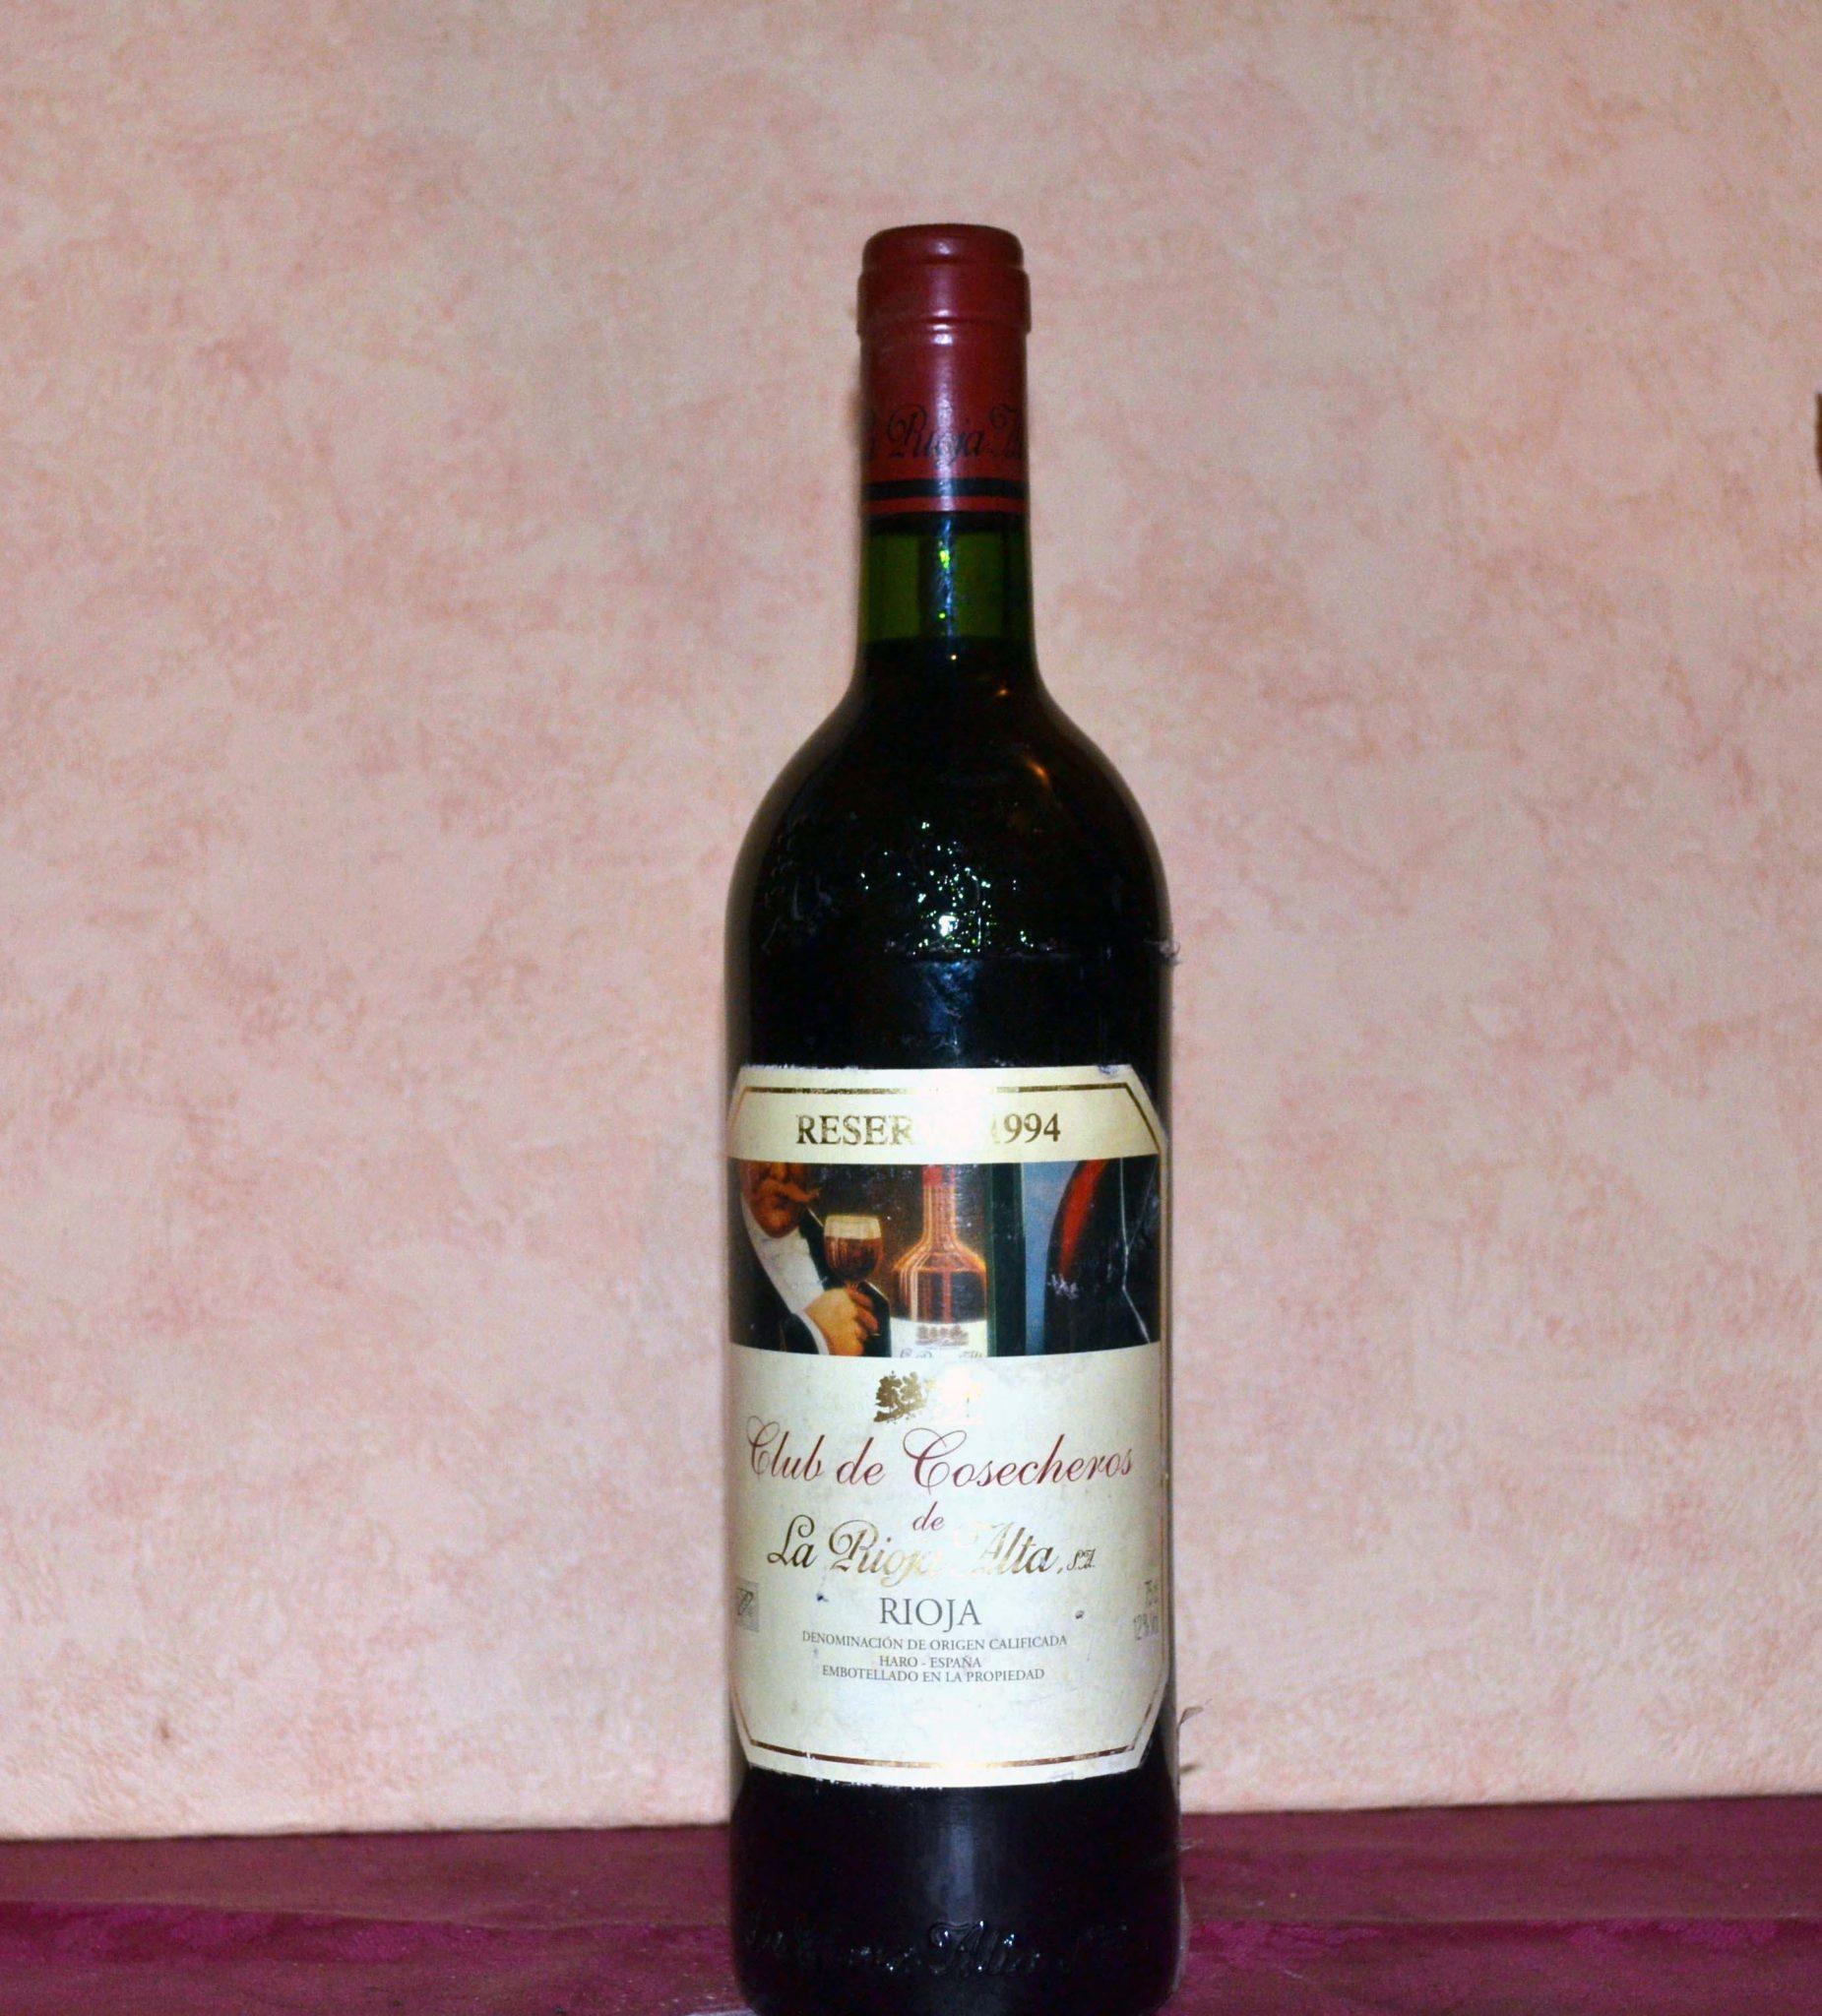 Club de Cosecheros Rioja Alta reserva 1994